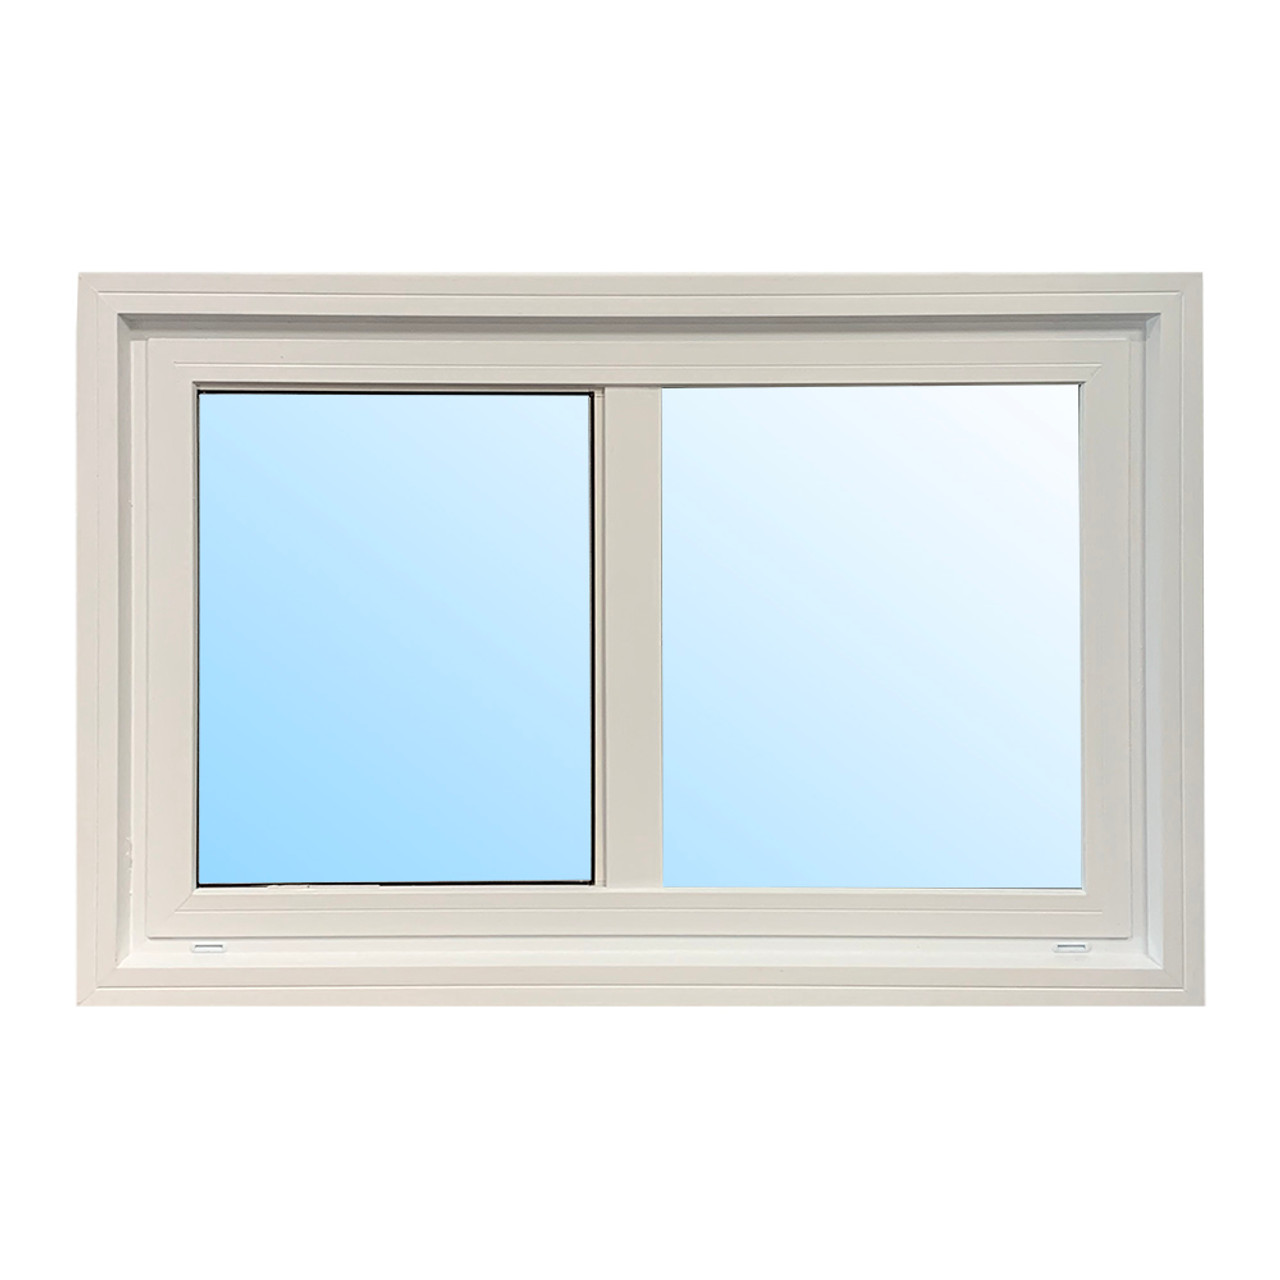 "Castlegard   48"" x 35"" Horizontal Slider Window   LEA"